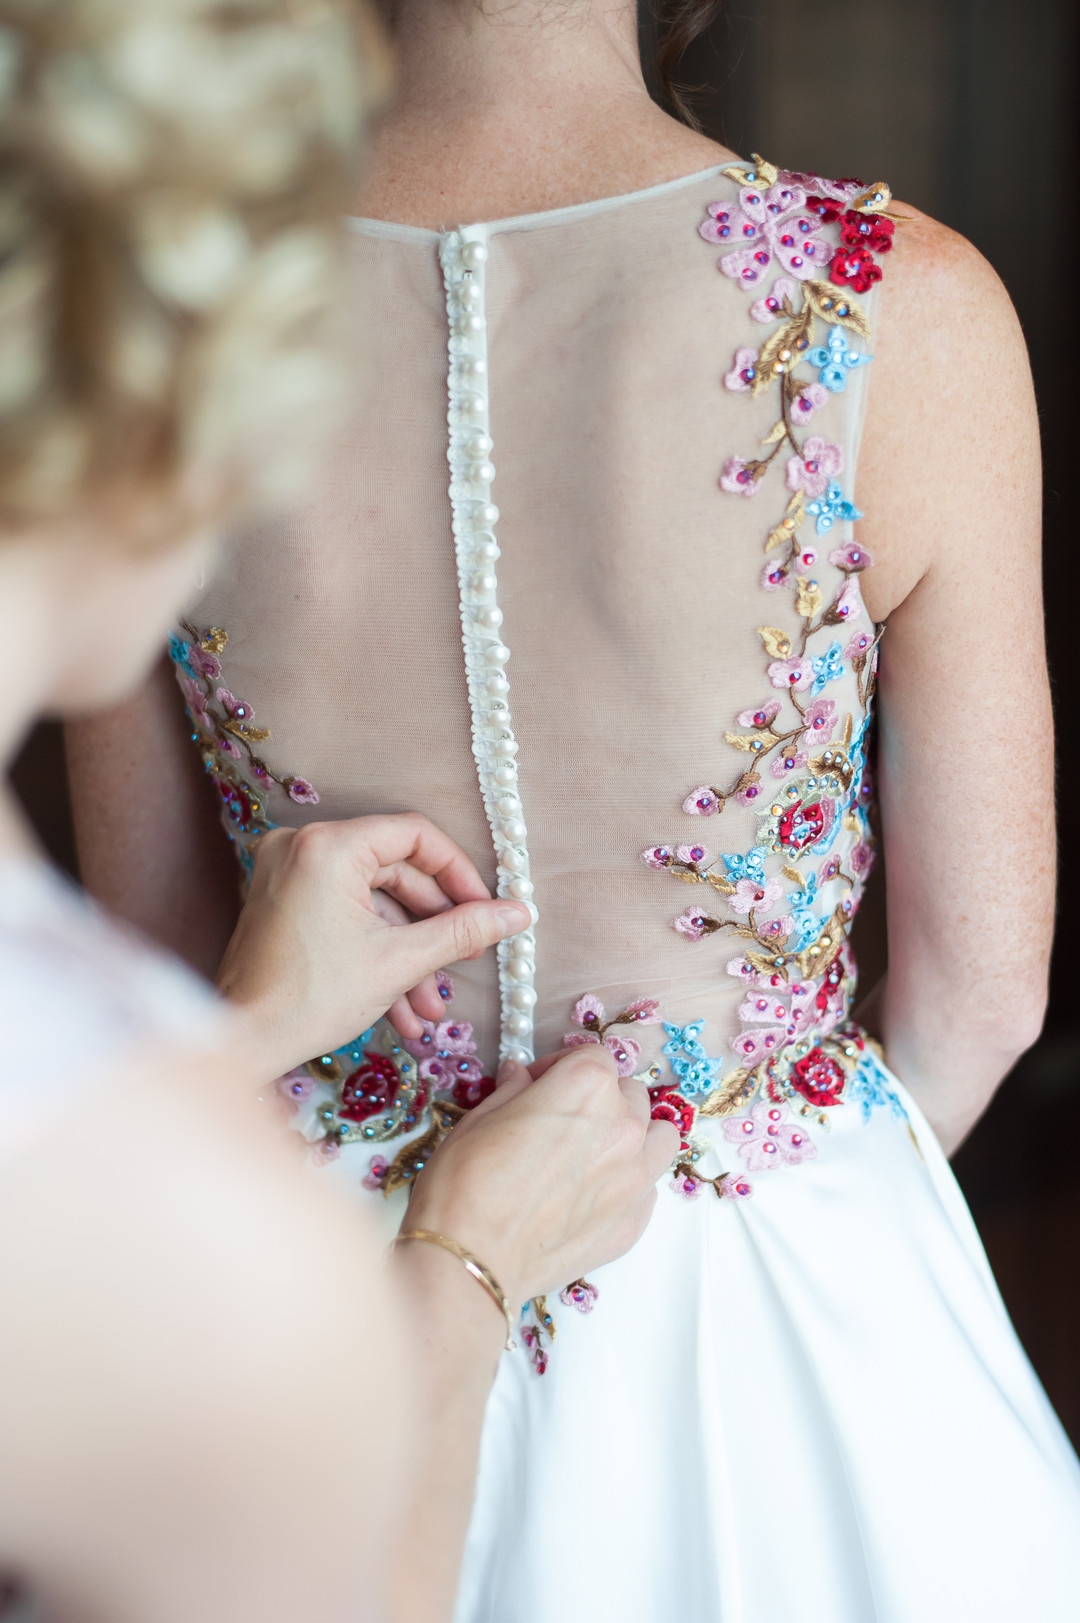 Mesh Button Down Bridal Gown Chicago Wedding Elite Photography